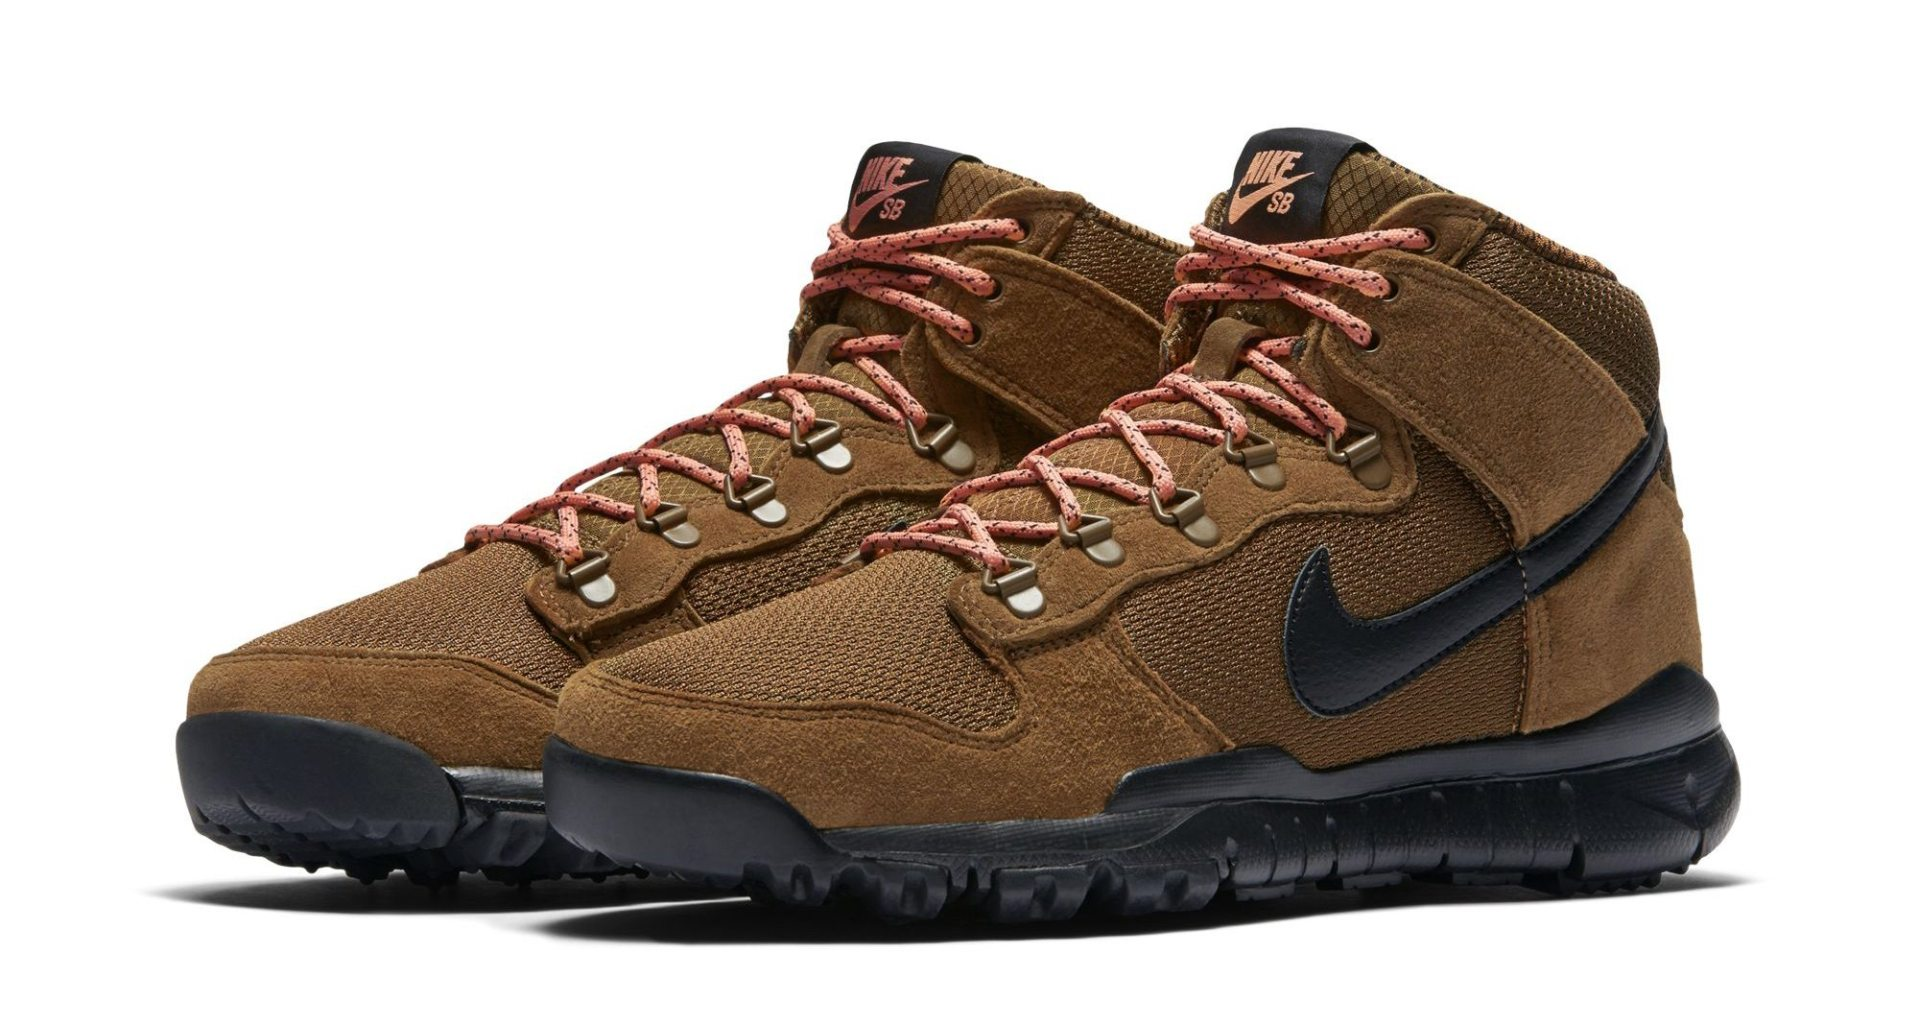 innovative design c1010 773bb Nike SB Dunk High Boot